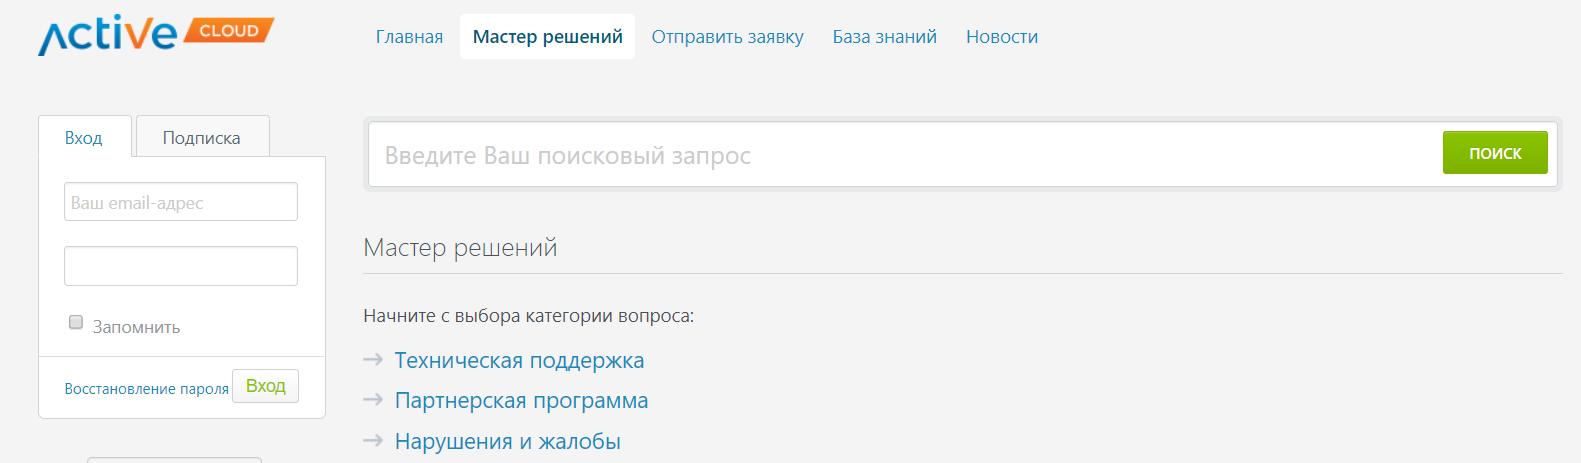 скрин2.png